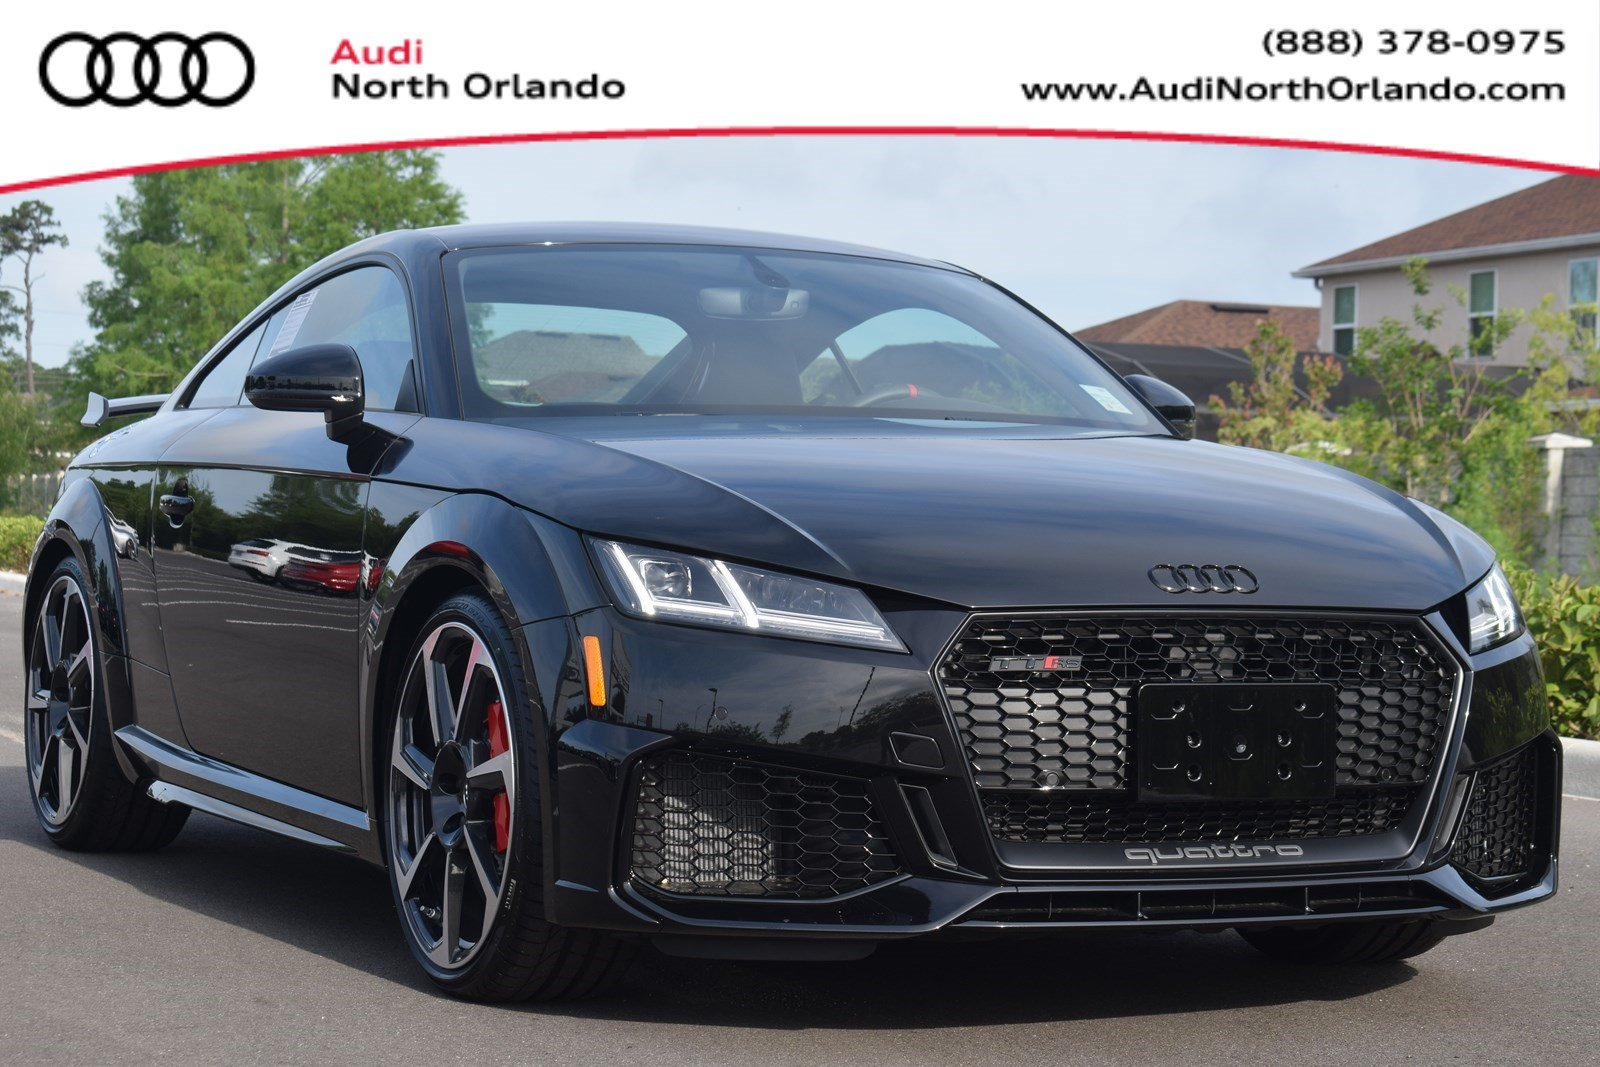 2019 Audi TT RS For Sale in Sanford FL   Audi North Orlando